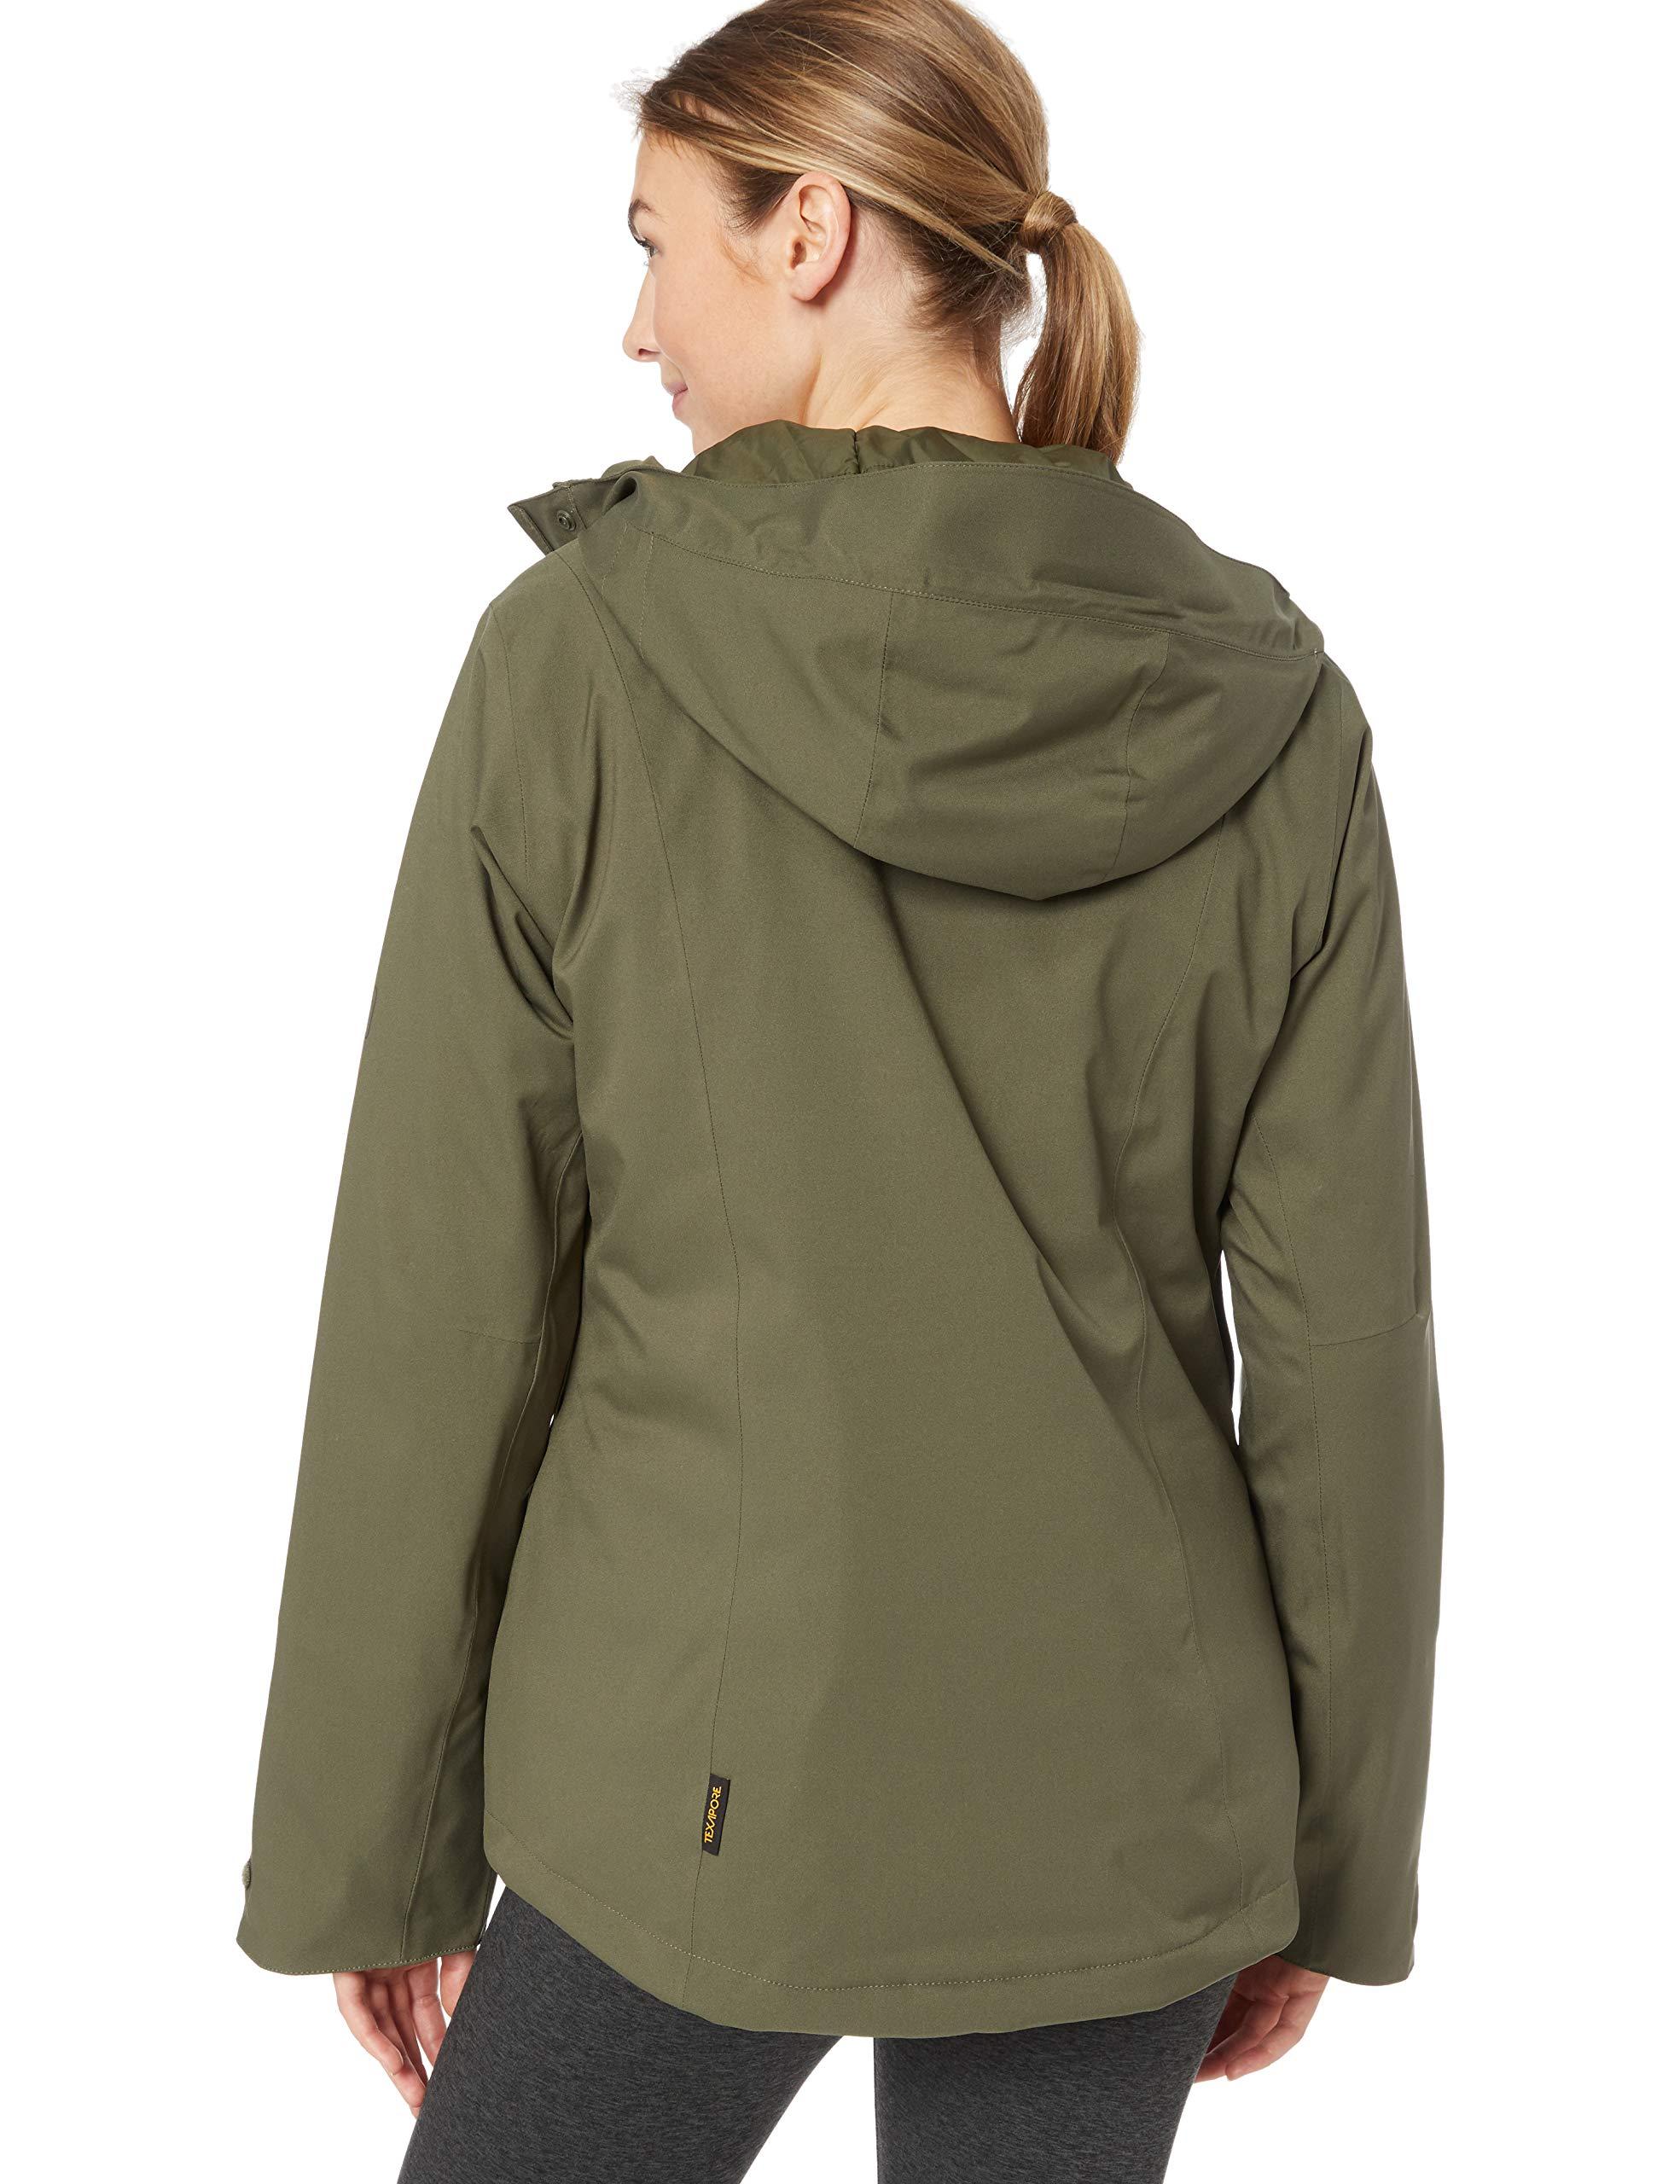 81mcjr rkmL - Jack Wolfskin Women's Troposphere Winterwanderjacke Wasserdicht Winddicht Atmungsaktiv Weather Protection Jacket